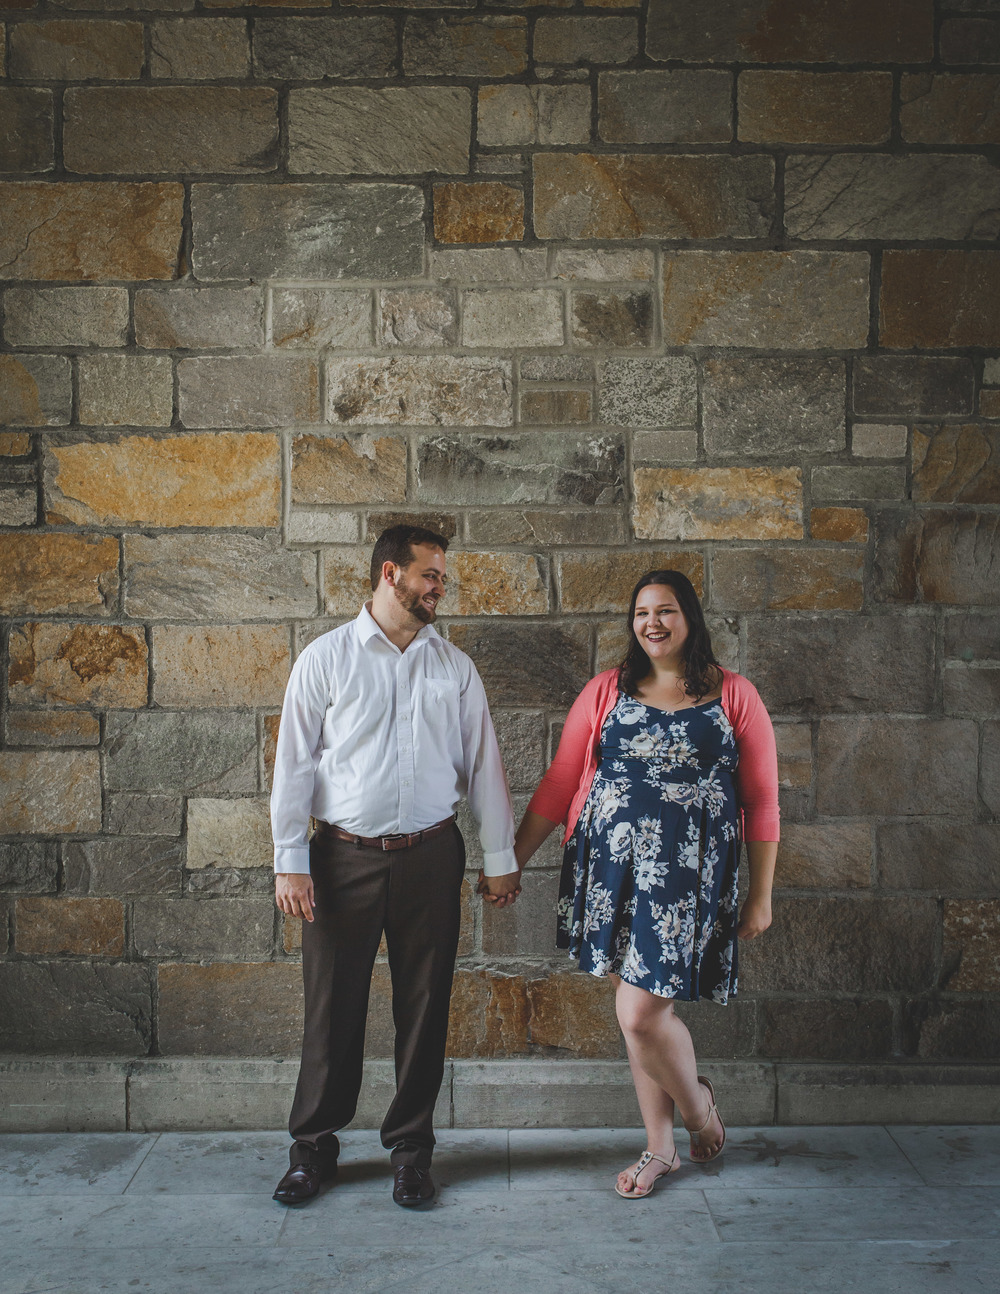 Erica and Stephen The Law Quad Ann Arbor MI